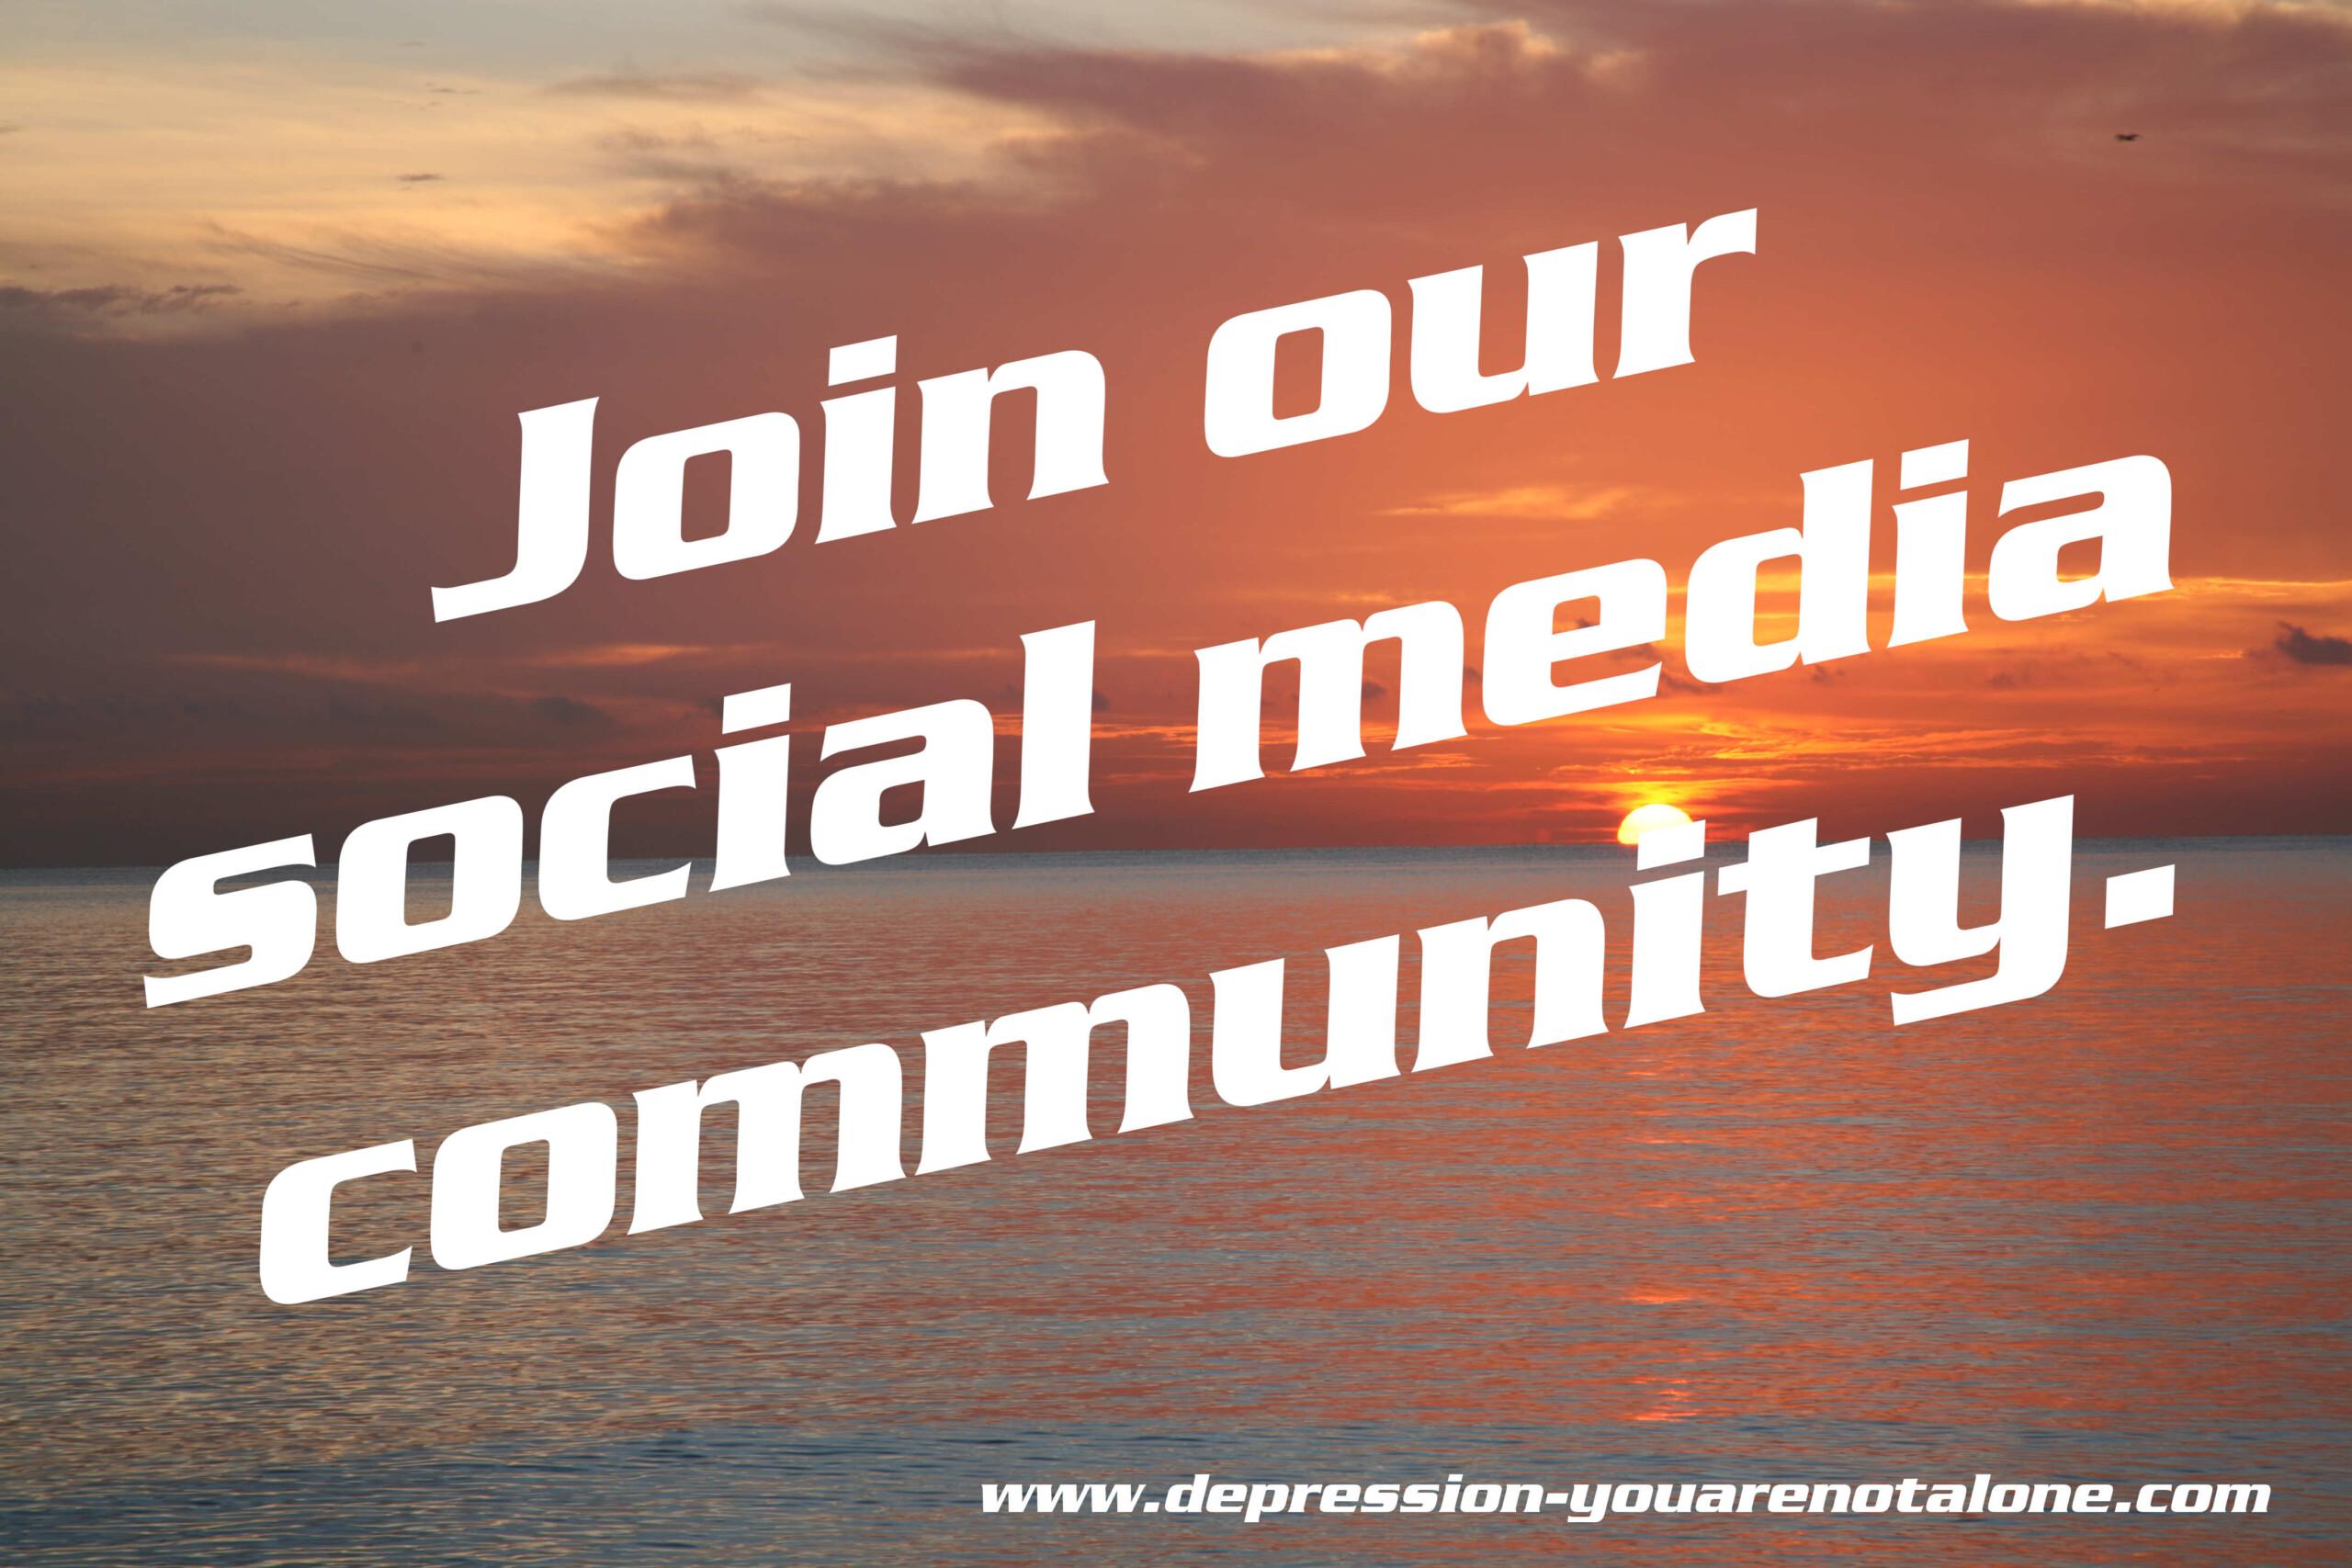 the words join our social media community over ocean sunrise